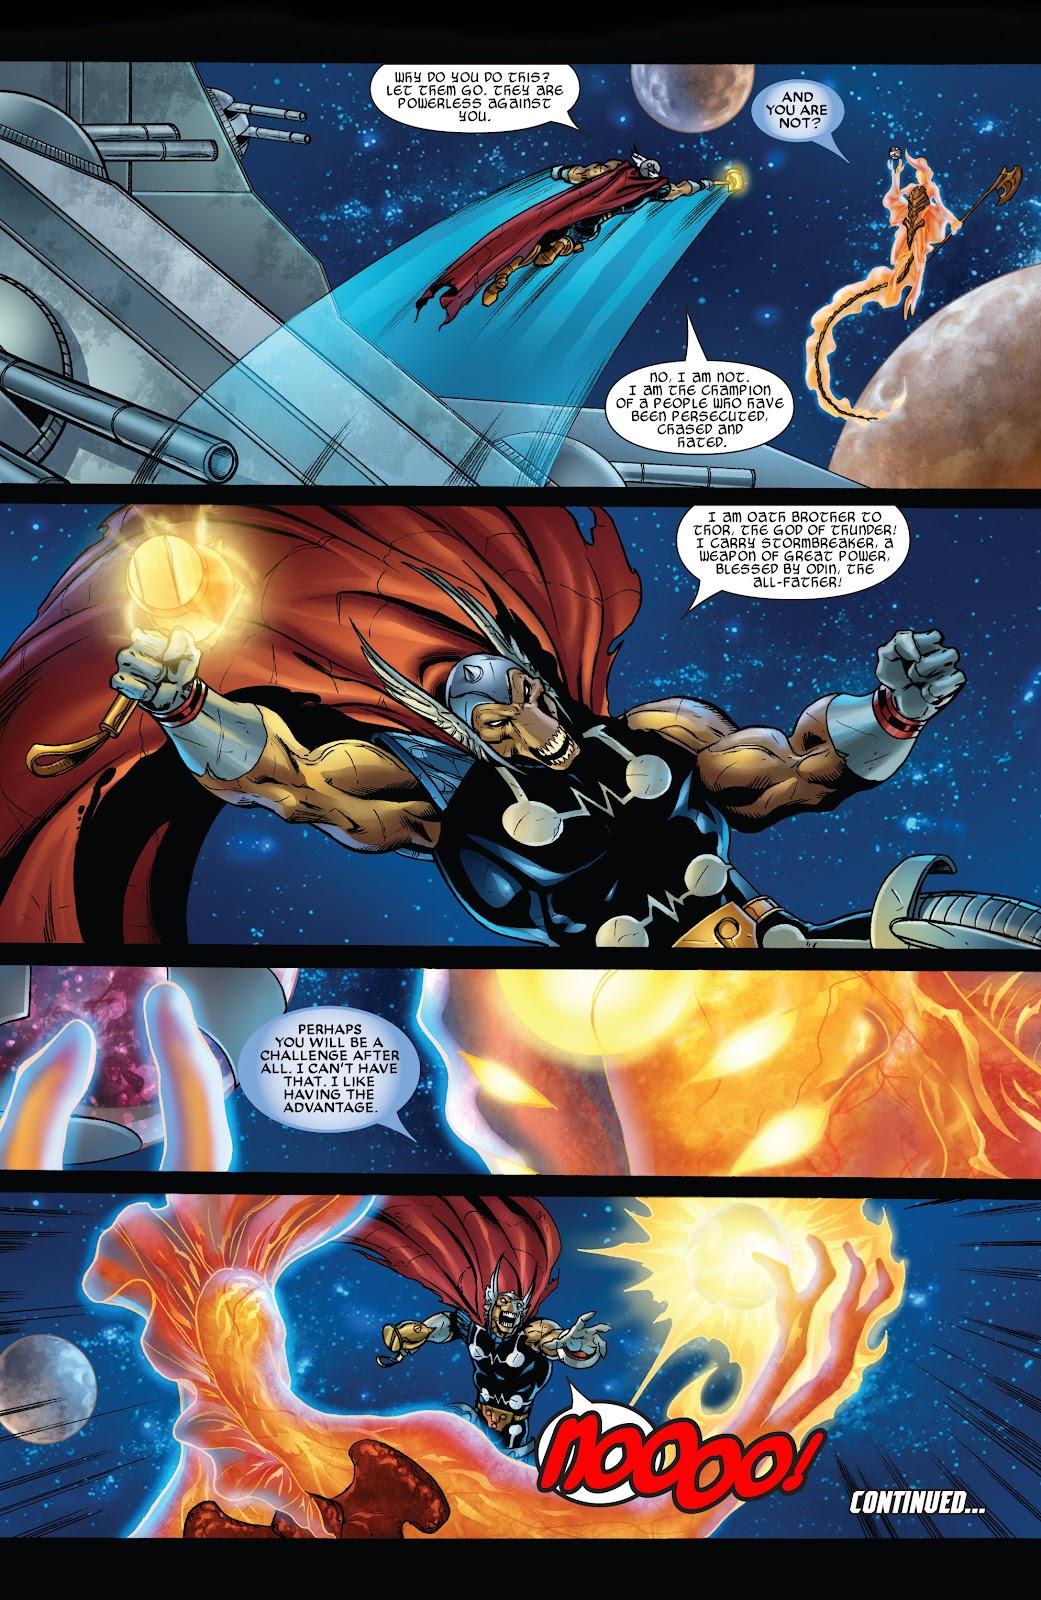 Read online Thor: Ragnaroks comic -  Issue # TPB (Part 4) - 5